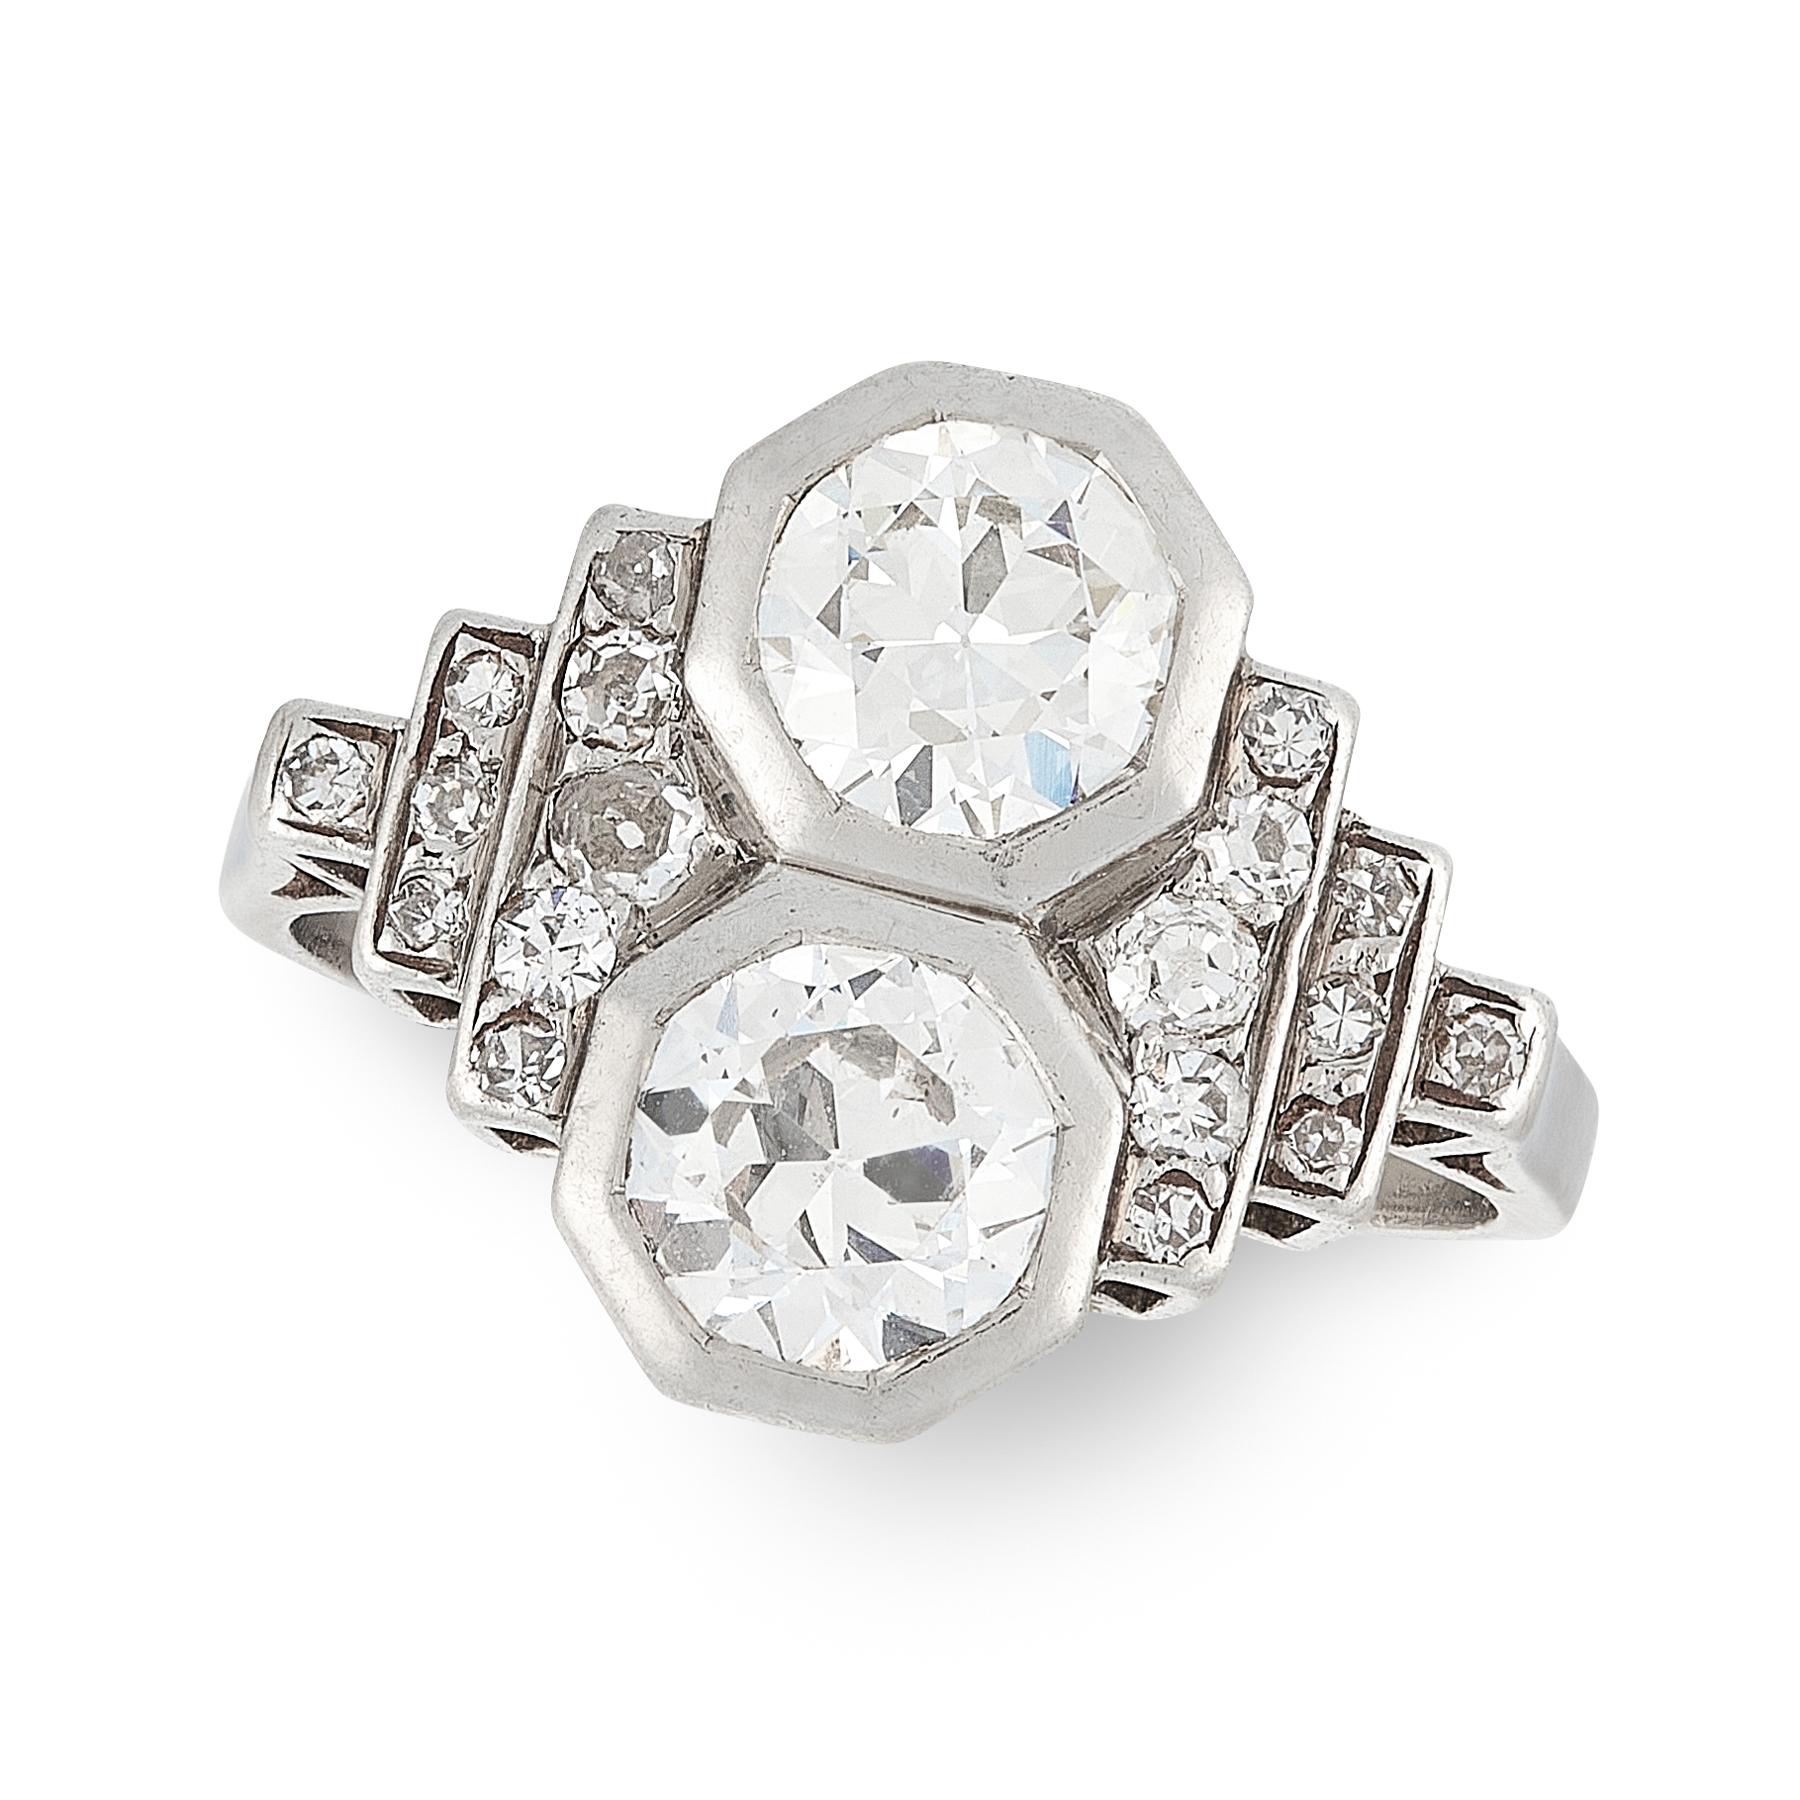 AN ART DECO DIAMOND RING, CIRCA 1935 in platinum, set with two principal old cut diamonds of 0.72